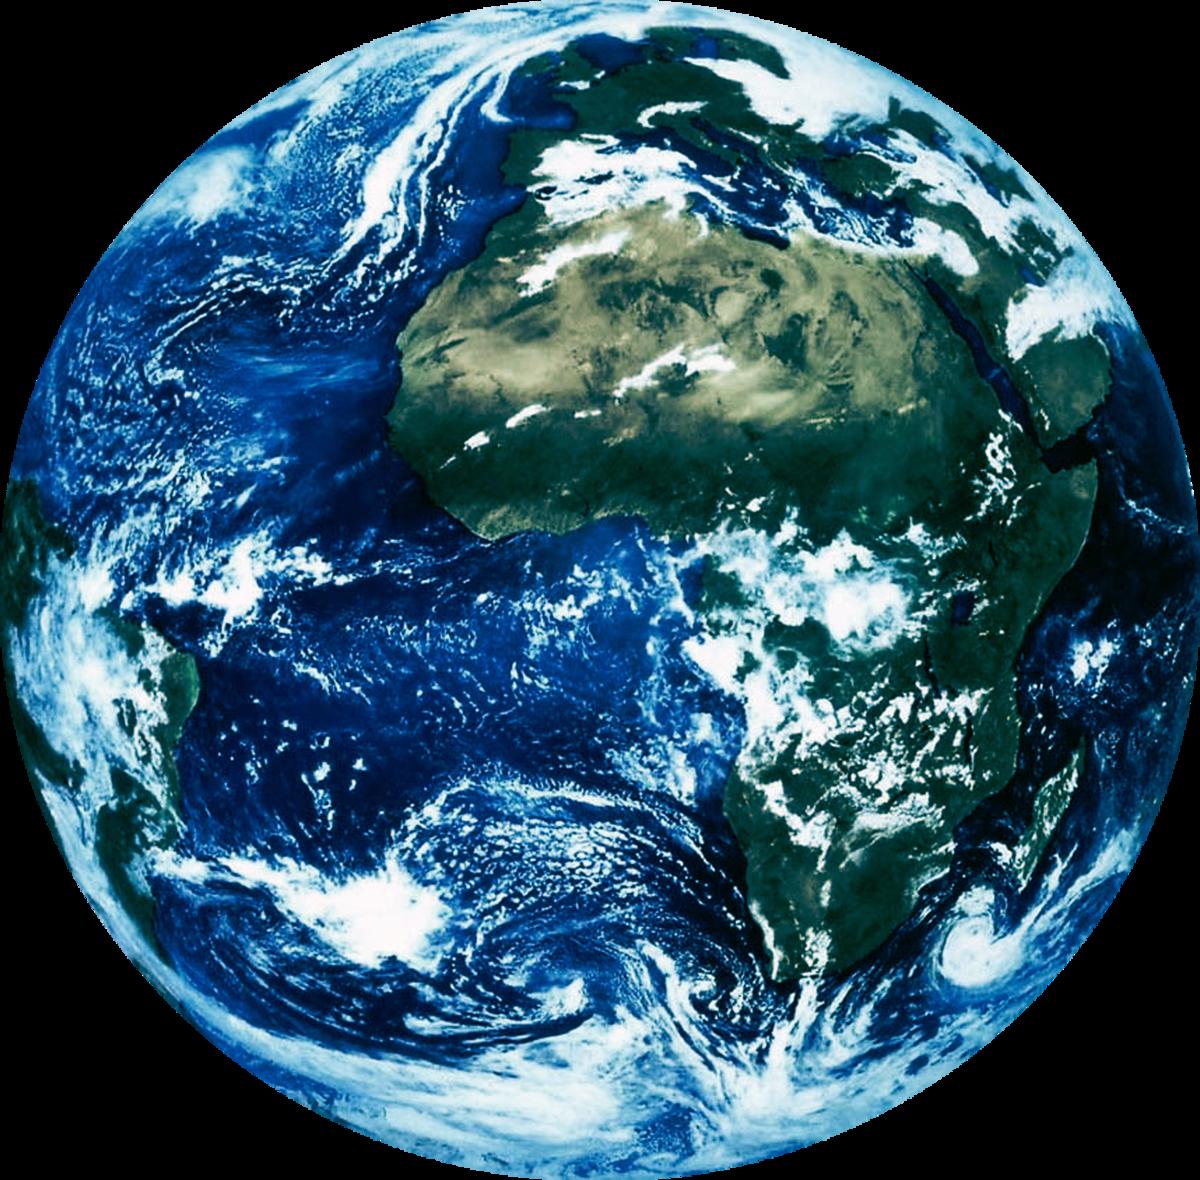 Картинка земли для презентации